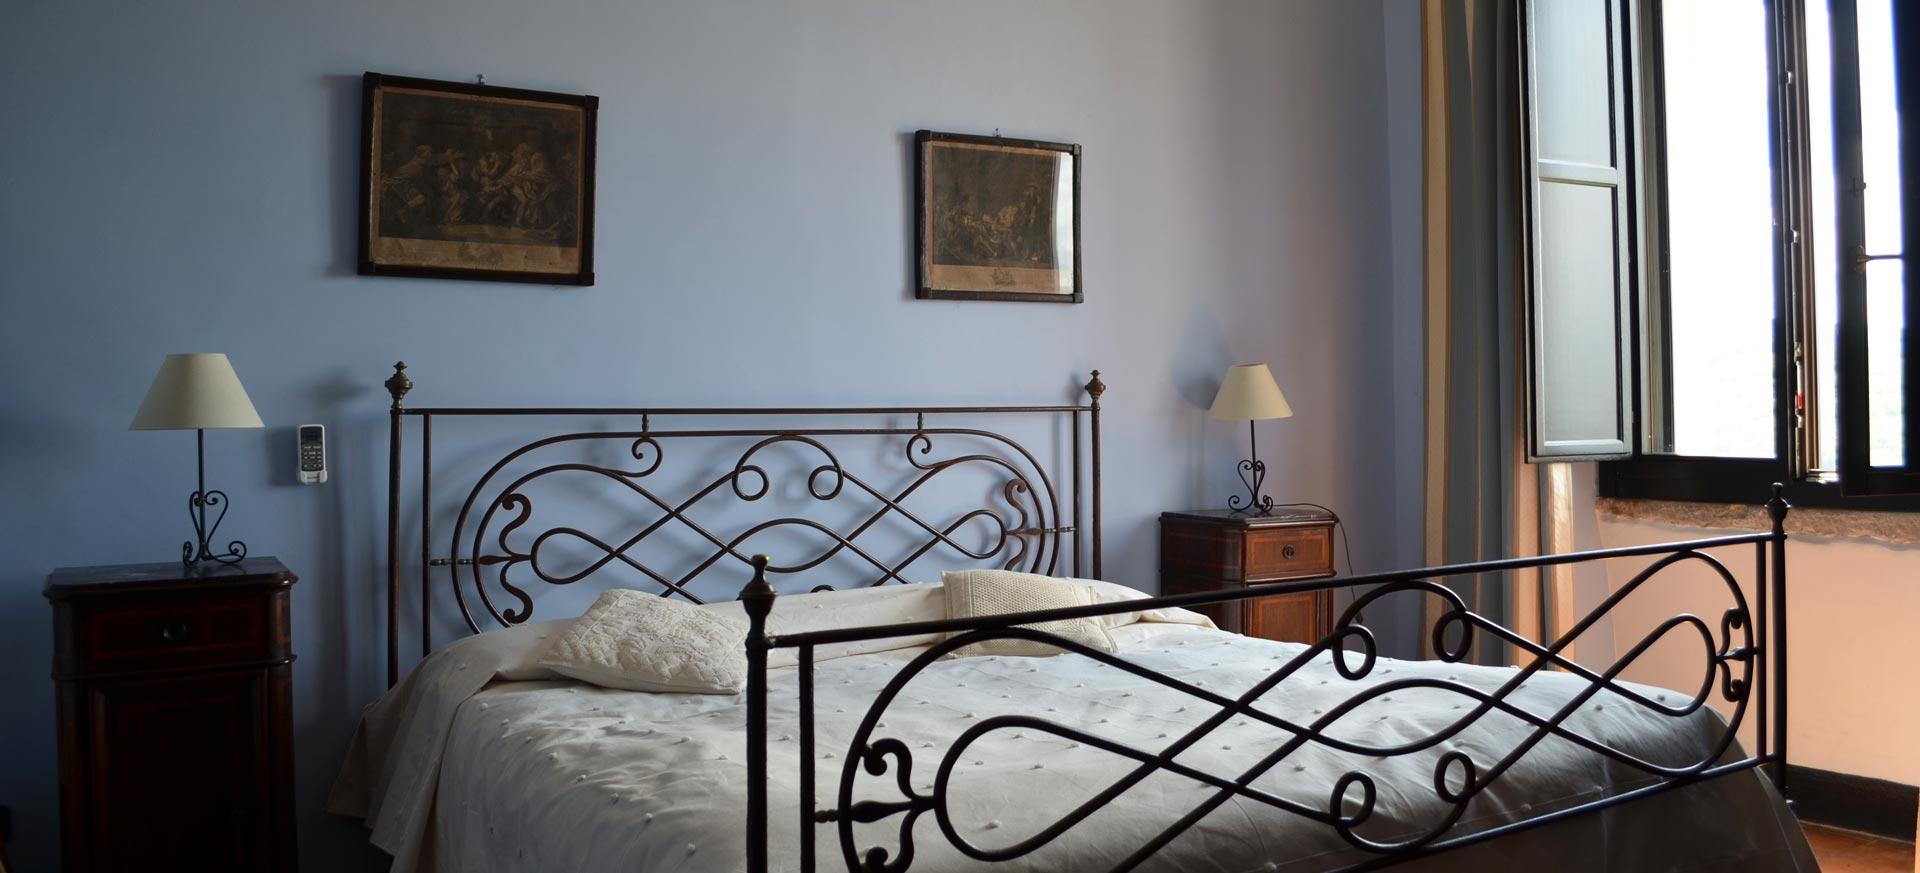 Resort, offerte, sud italia, south of italy, south, sud, italia, italy, unesco, camera,. Paestum Boutique Hotel B B Historic House Giungano Hote Italia Selection